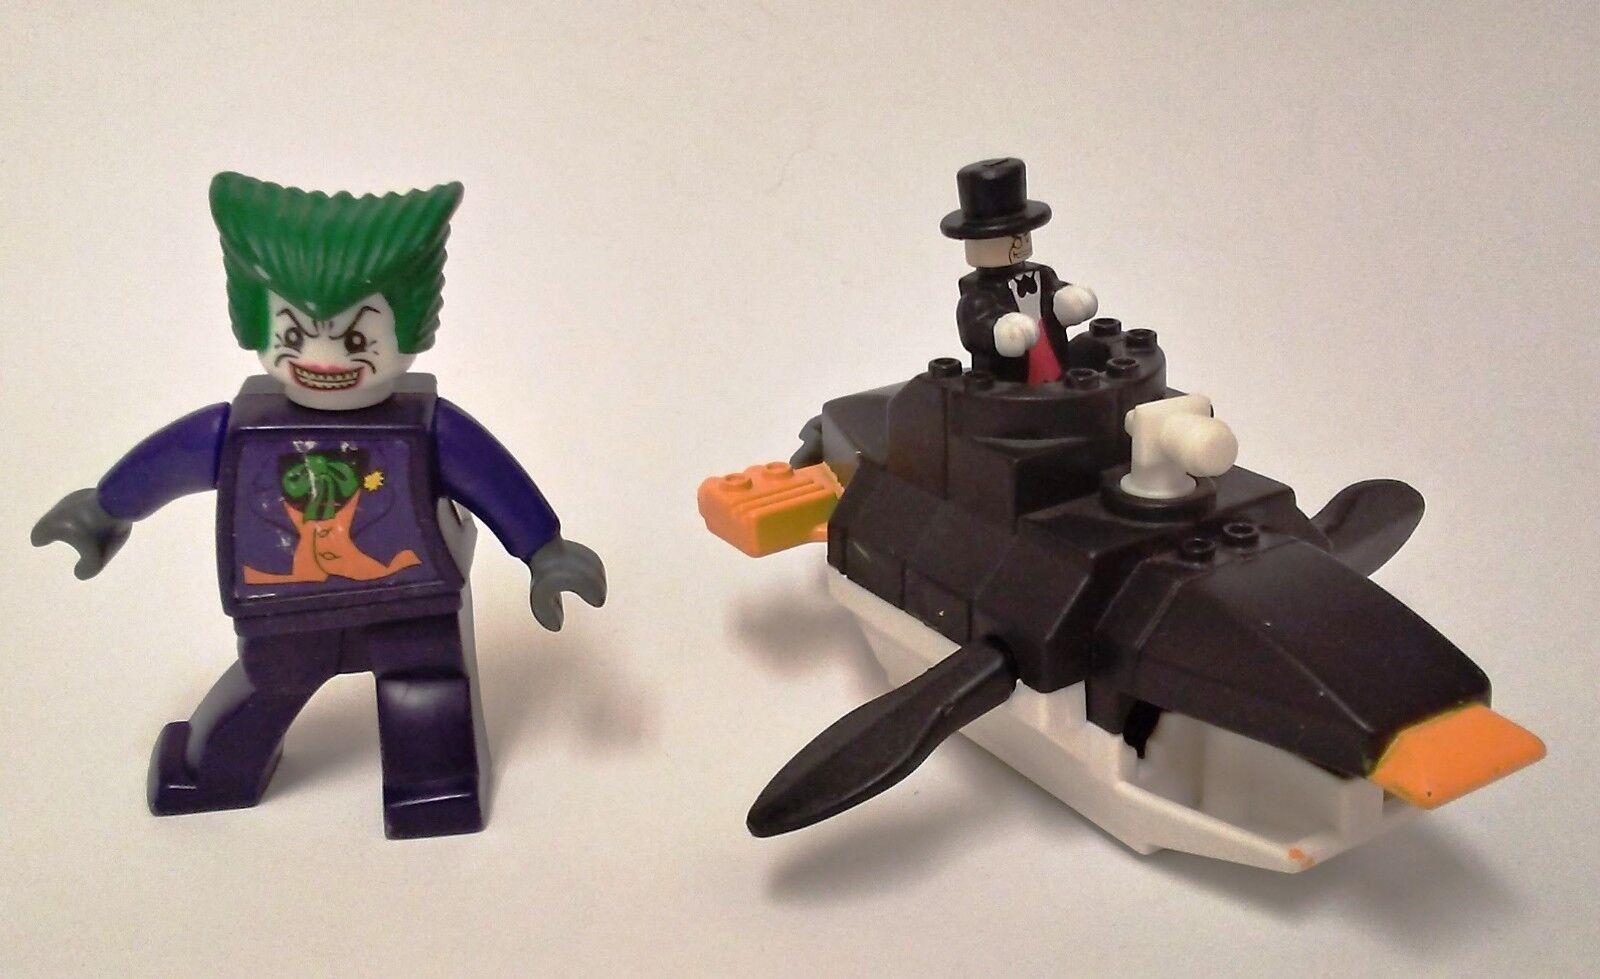 LEGO MCDONALDS  BATMAN  PENGUIN SUBMARINE  JOKER  HAPPY MEAL TOYS  2008